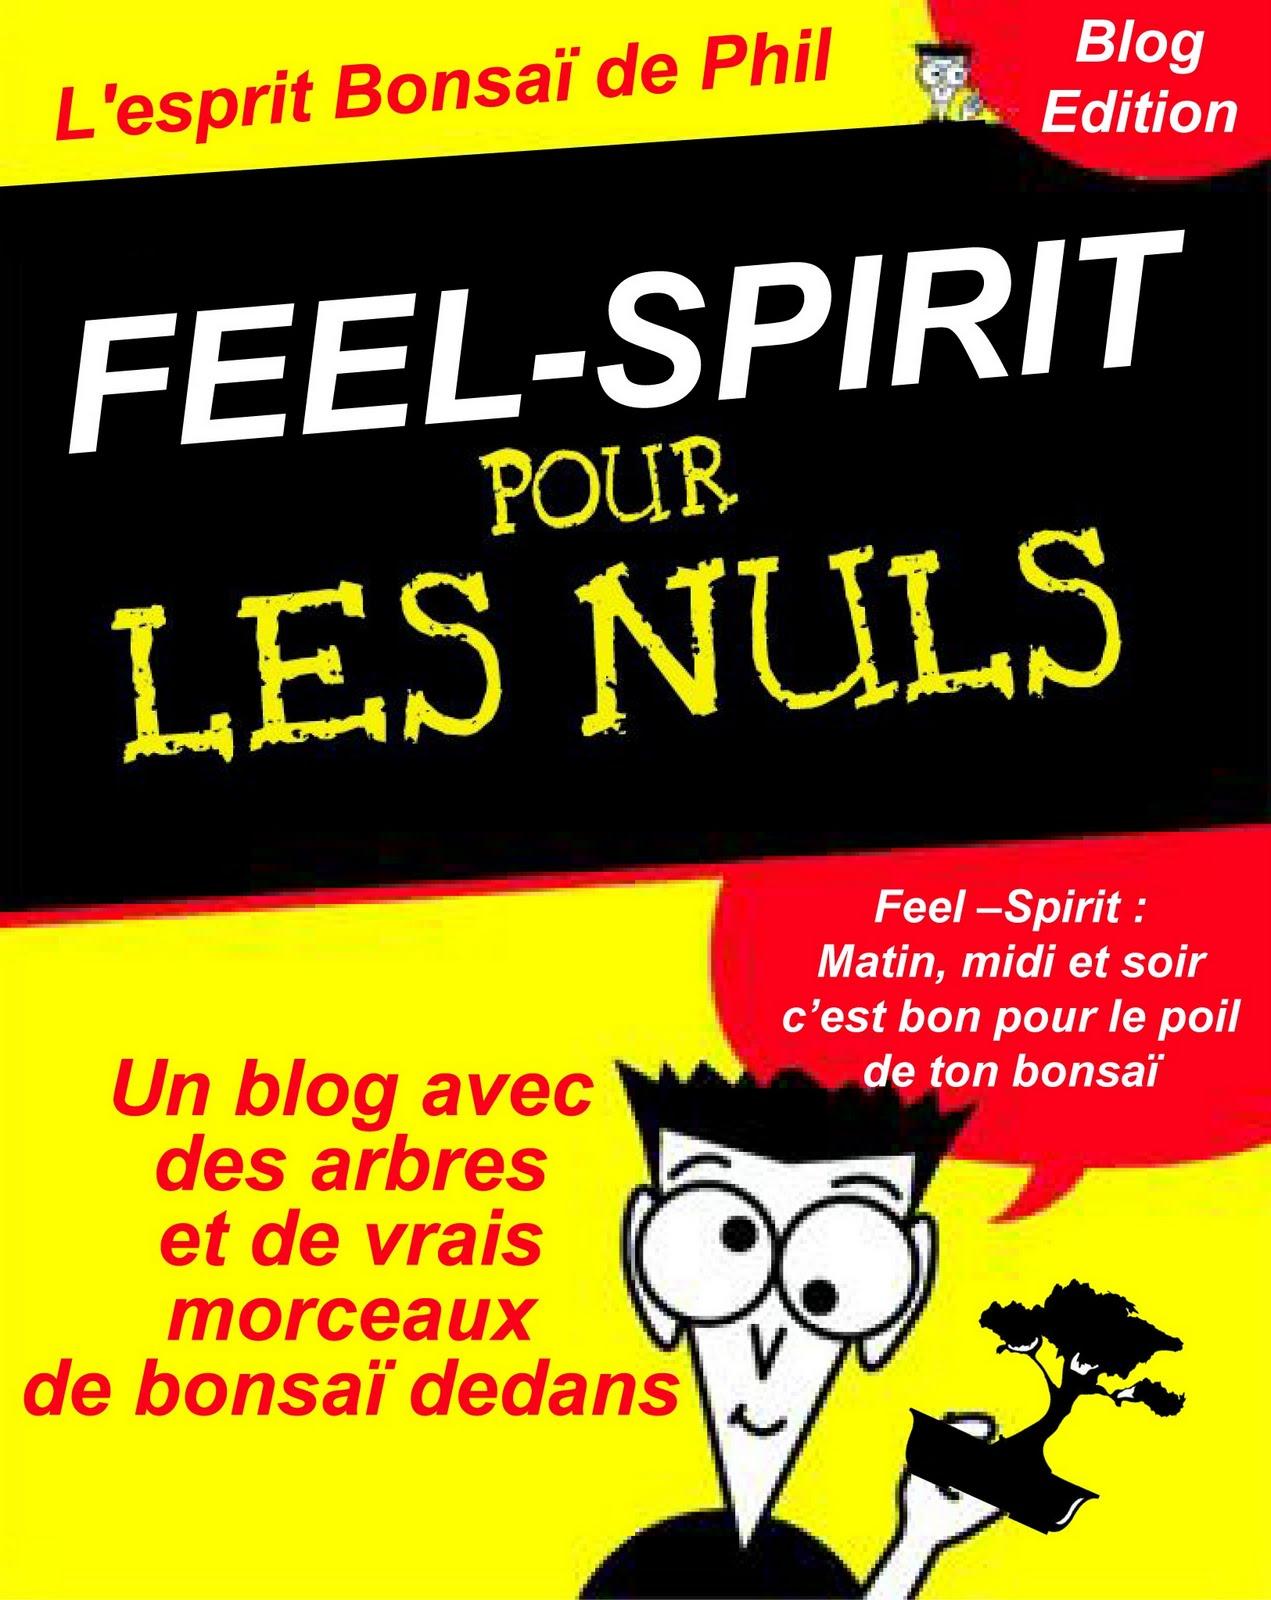 feel spirit l 39 esprit de phil bonsa feel spirit pour. Black Bedroom Furniture Sets. Home Design Ideas